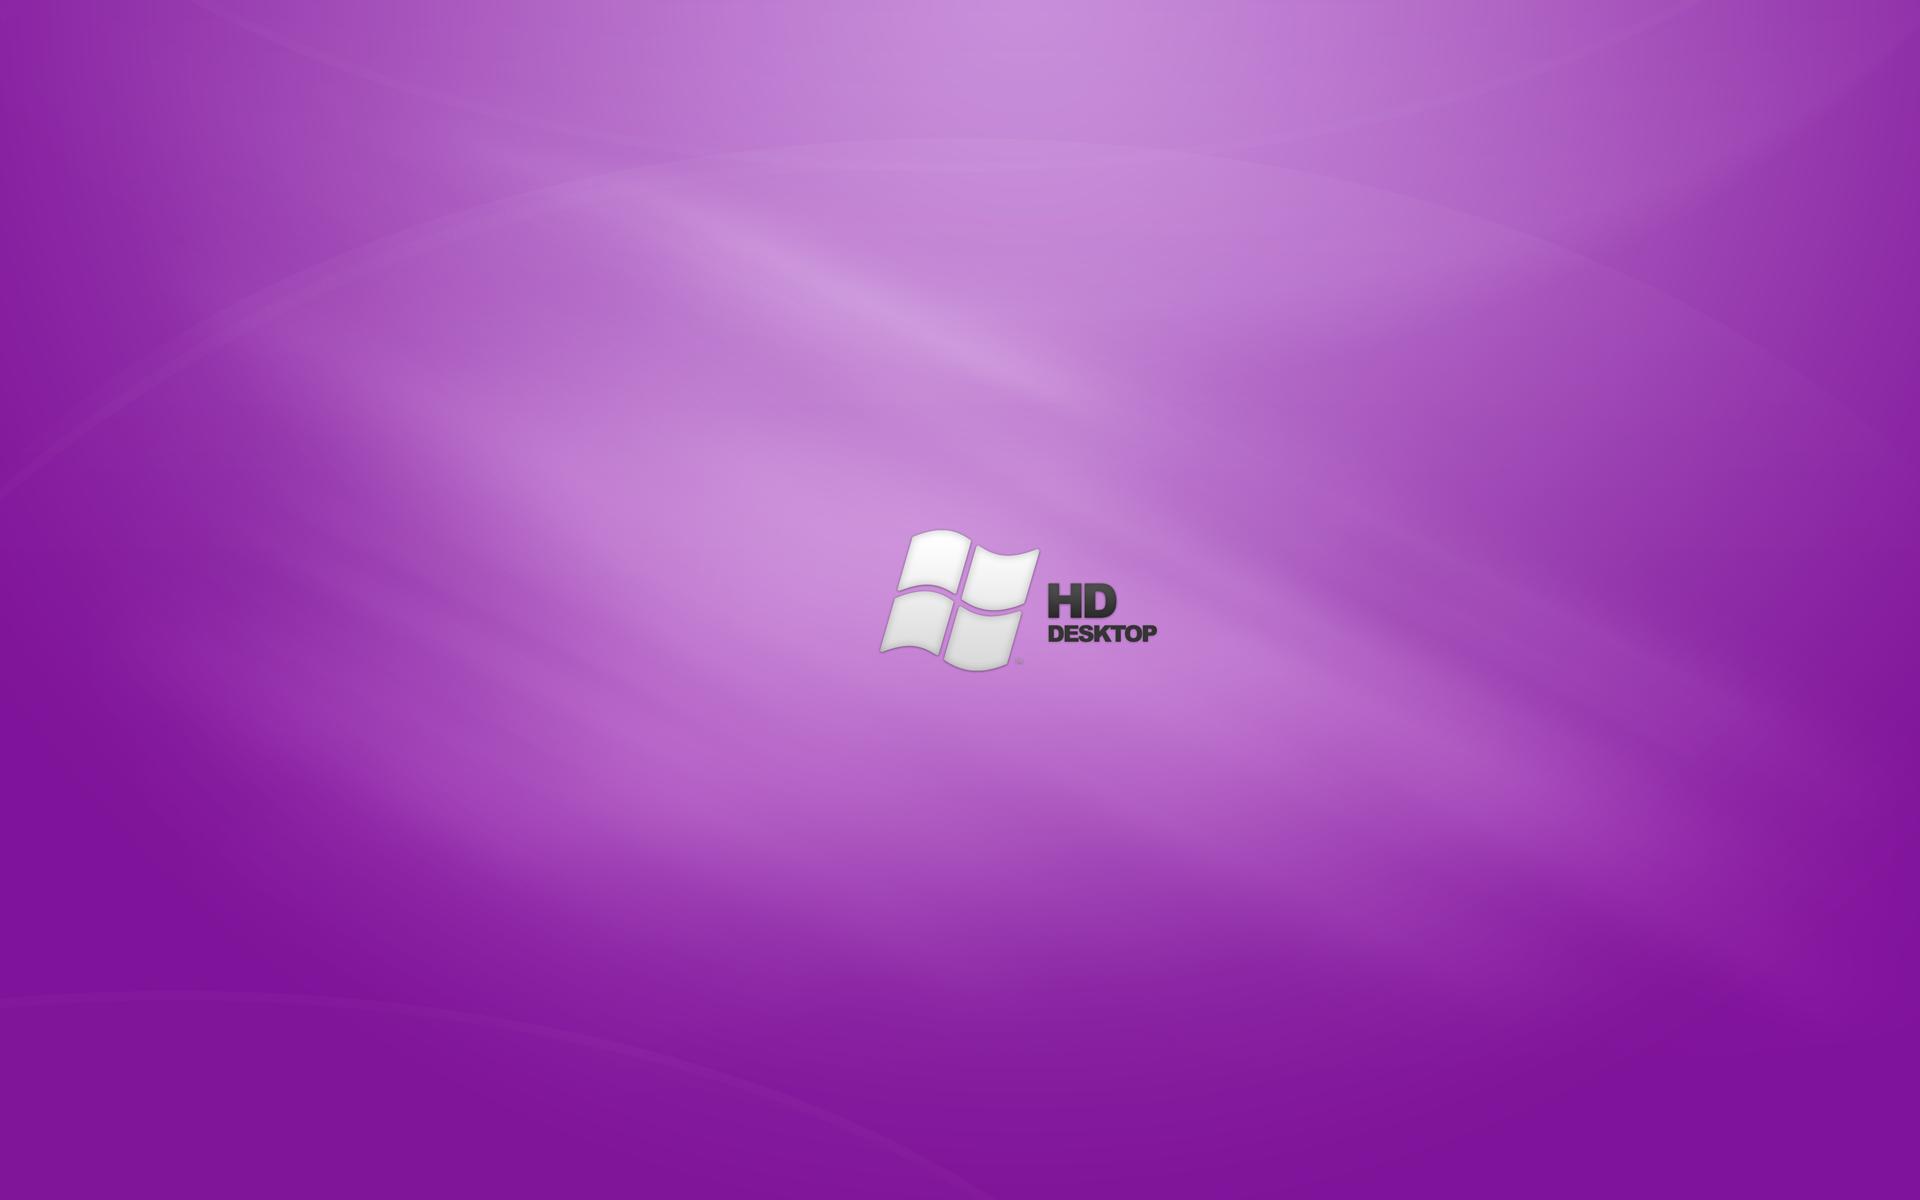 Windows Desktop Wallpaper Vista Purple 1920x1200